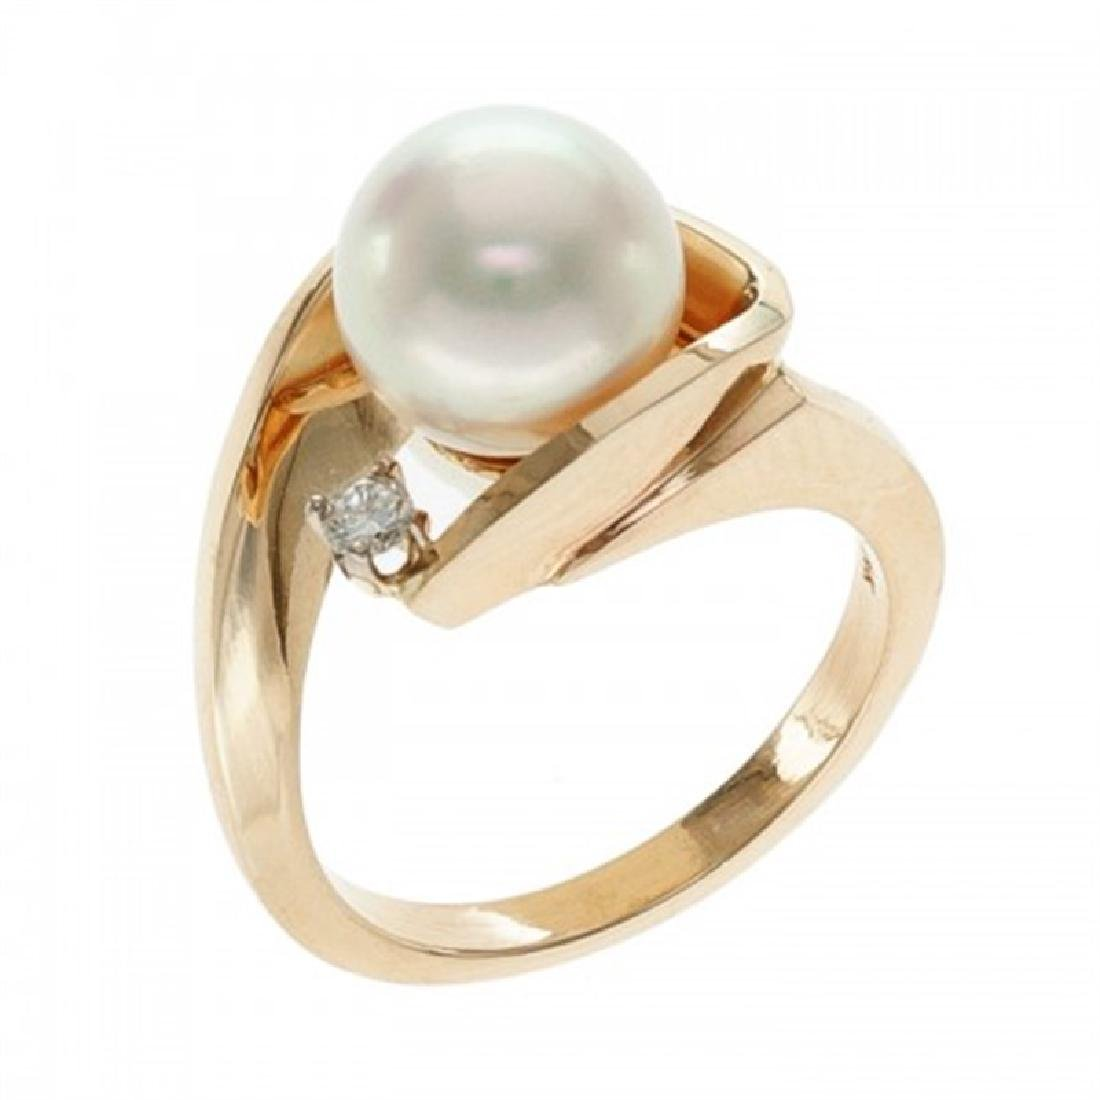 9.0-9.5mm Japanese Akoya Pearl Ring with Diamond